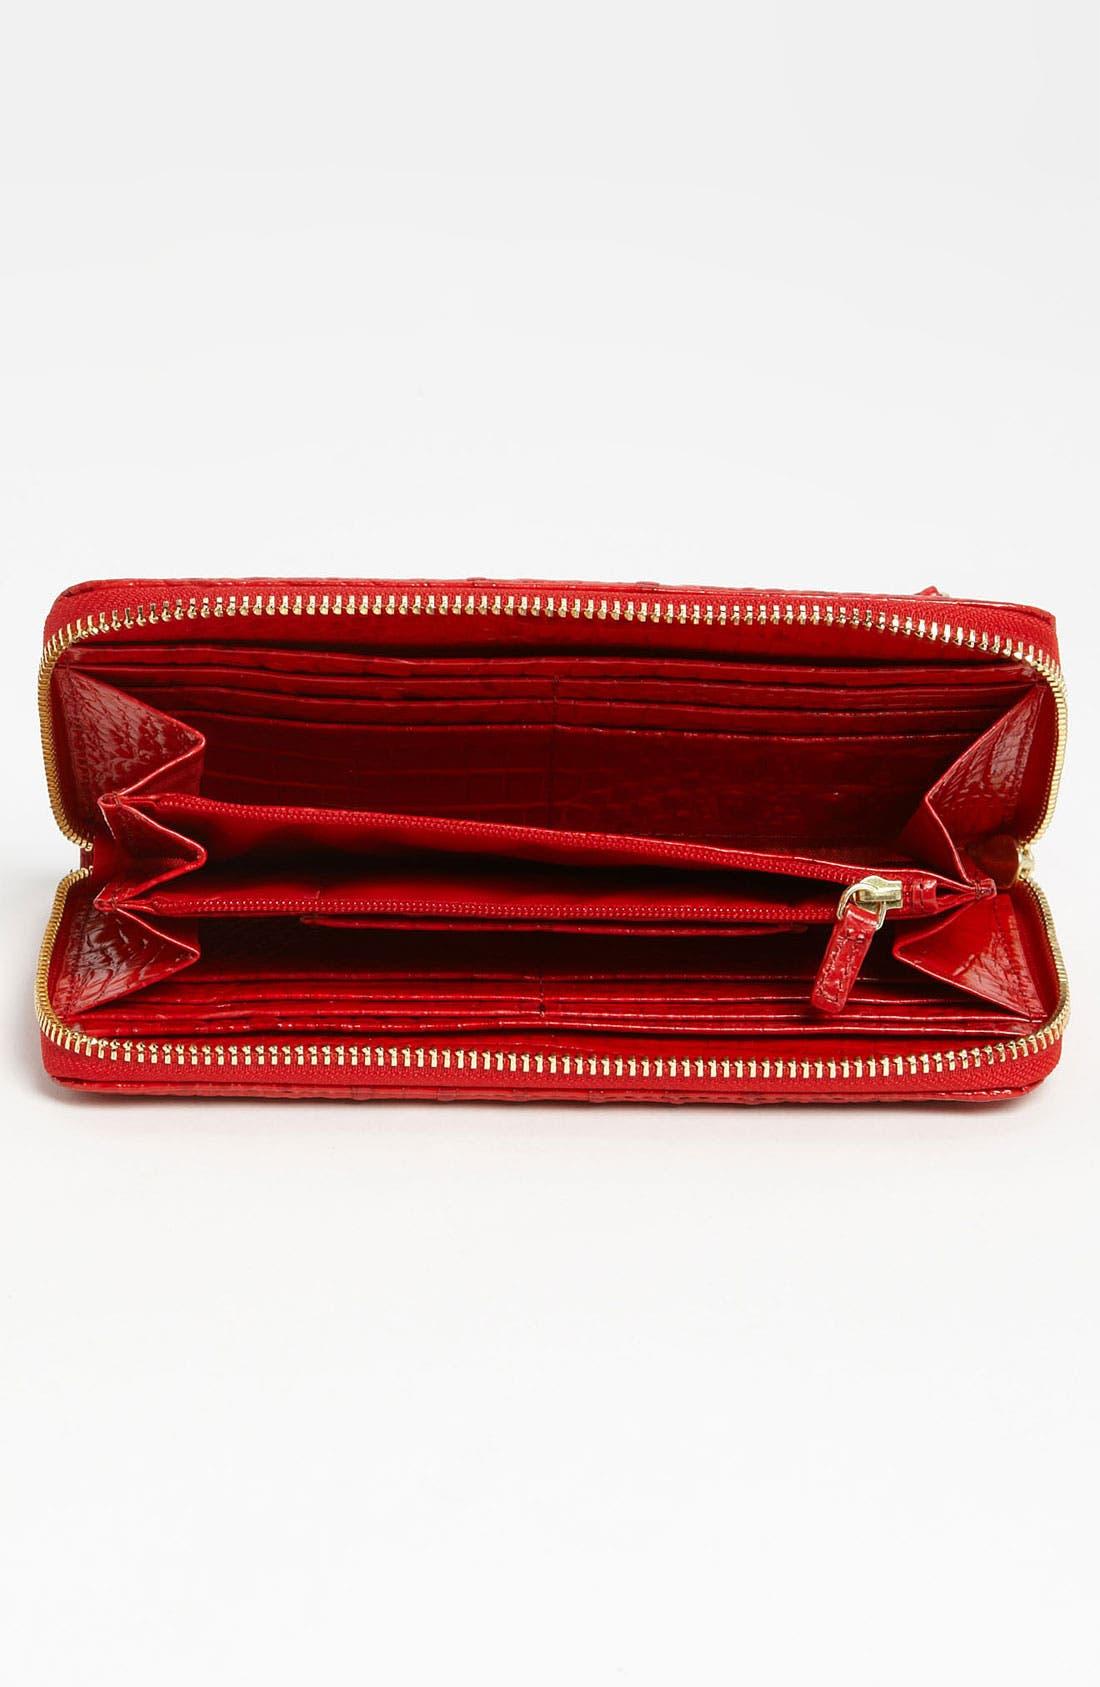 Alternate Image 3  - Brahmin 'Suri' Zip Around Wallet